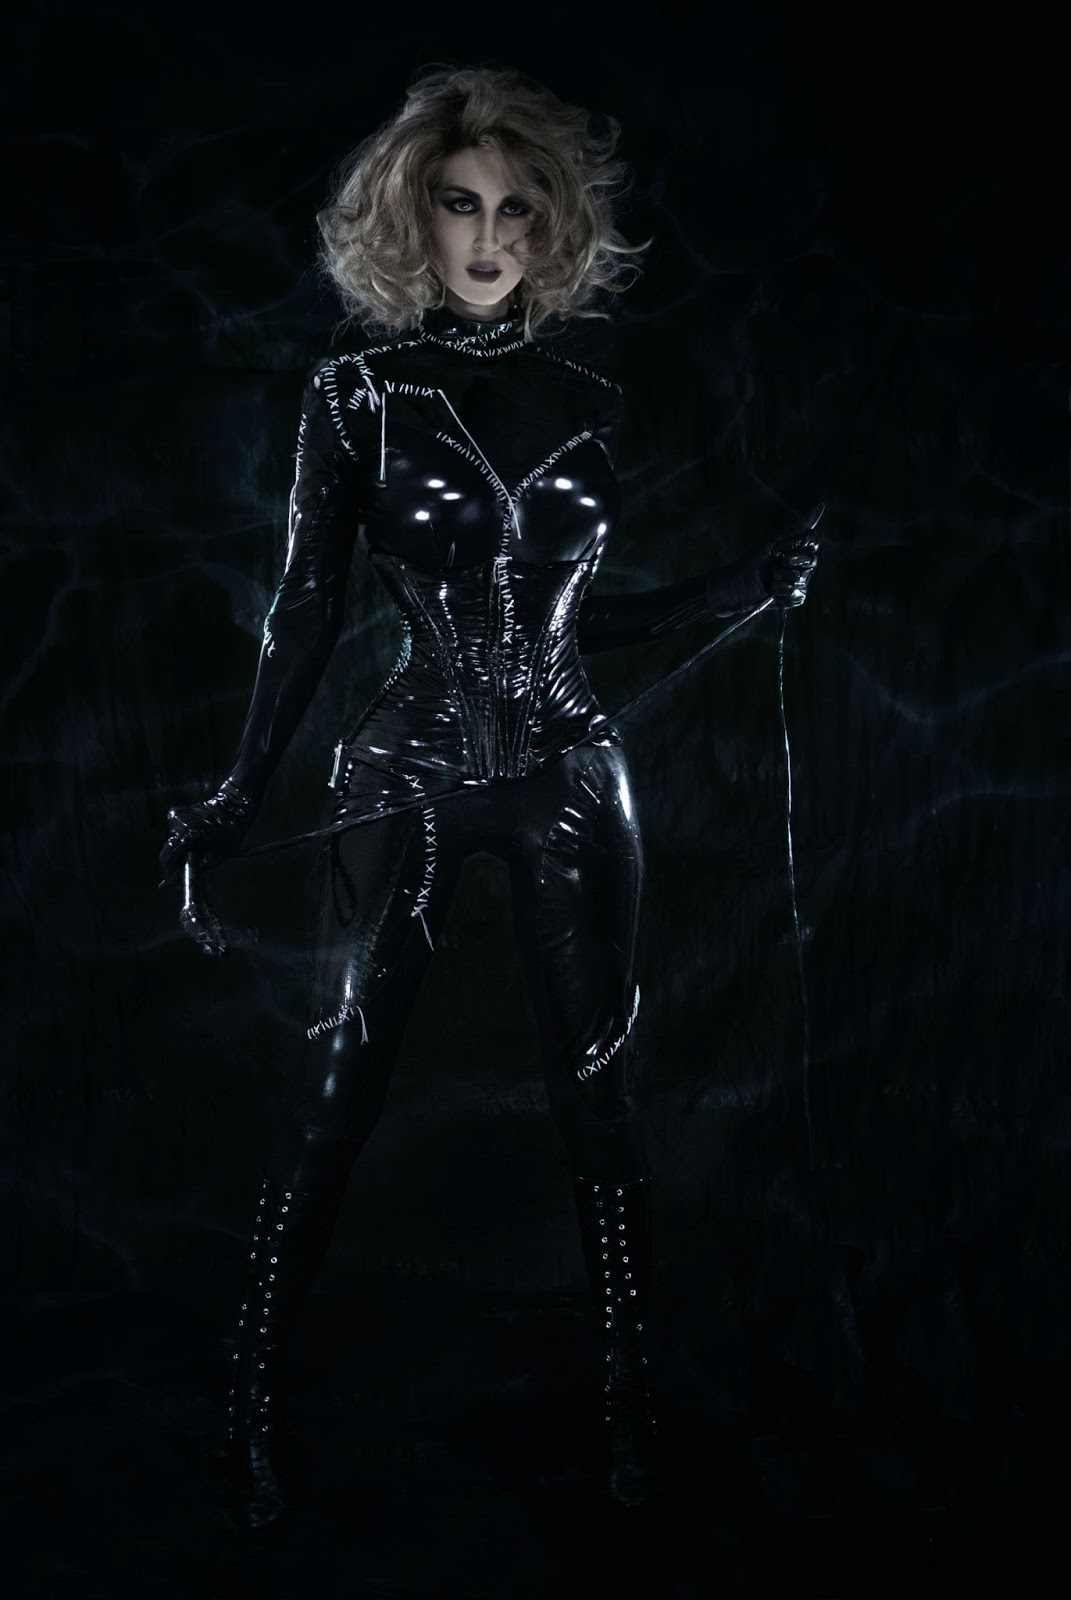 Catwoman, Tim Burton style